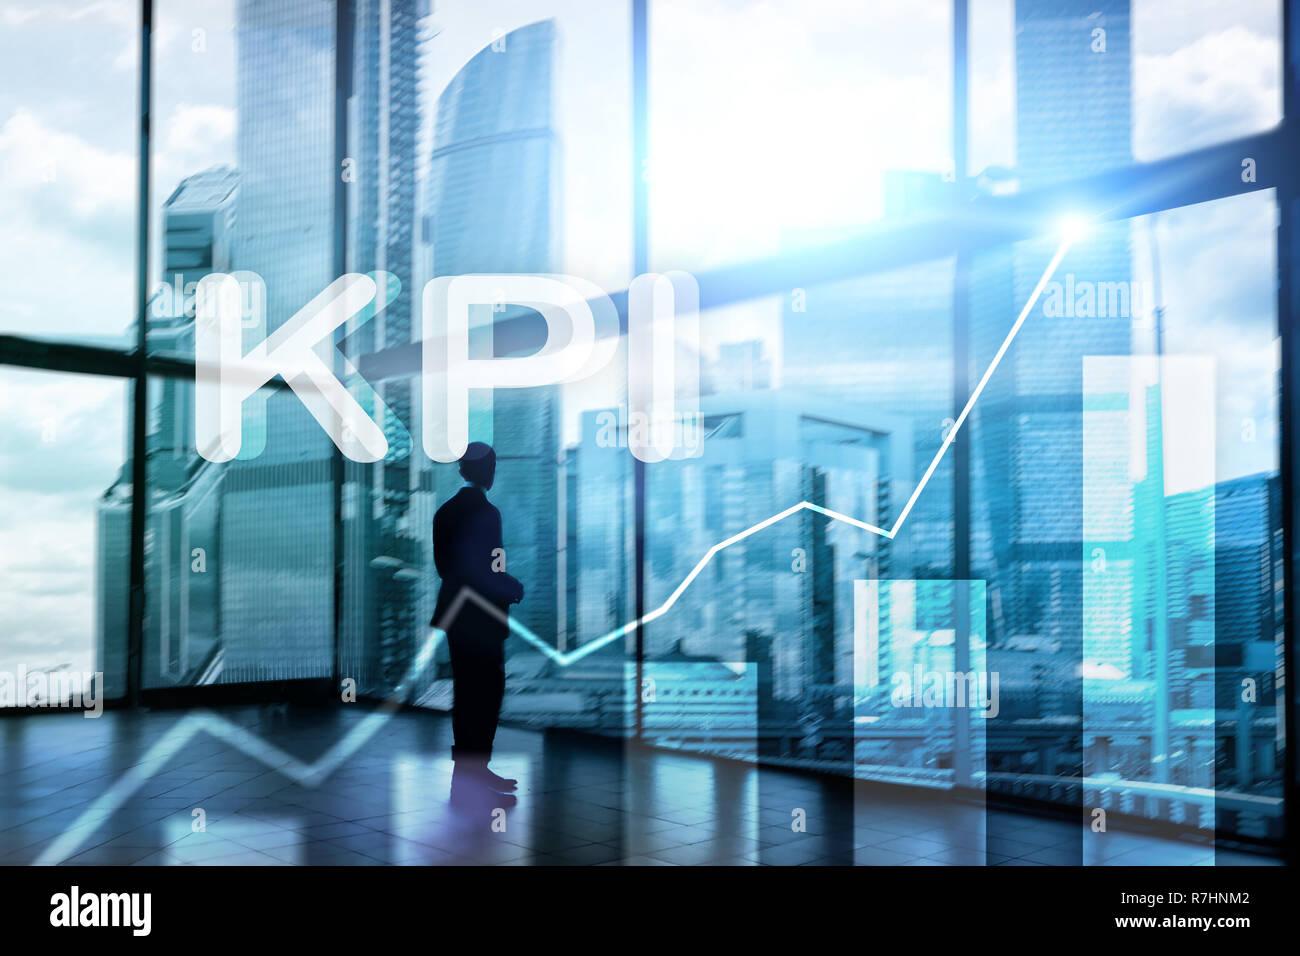 KPI - Key performance indicator graph on blurred background. Stock Photo